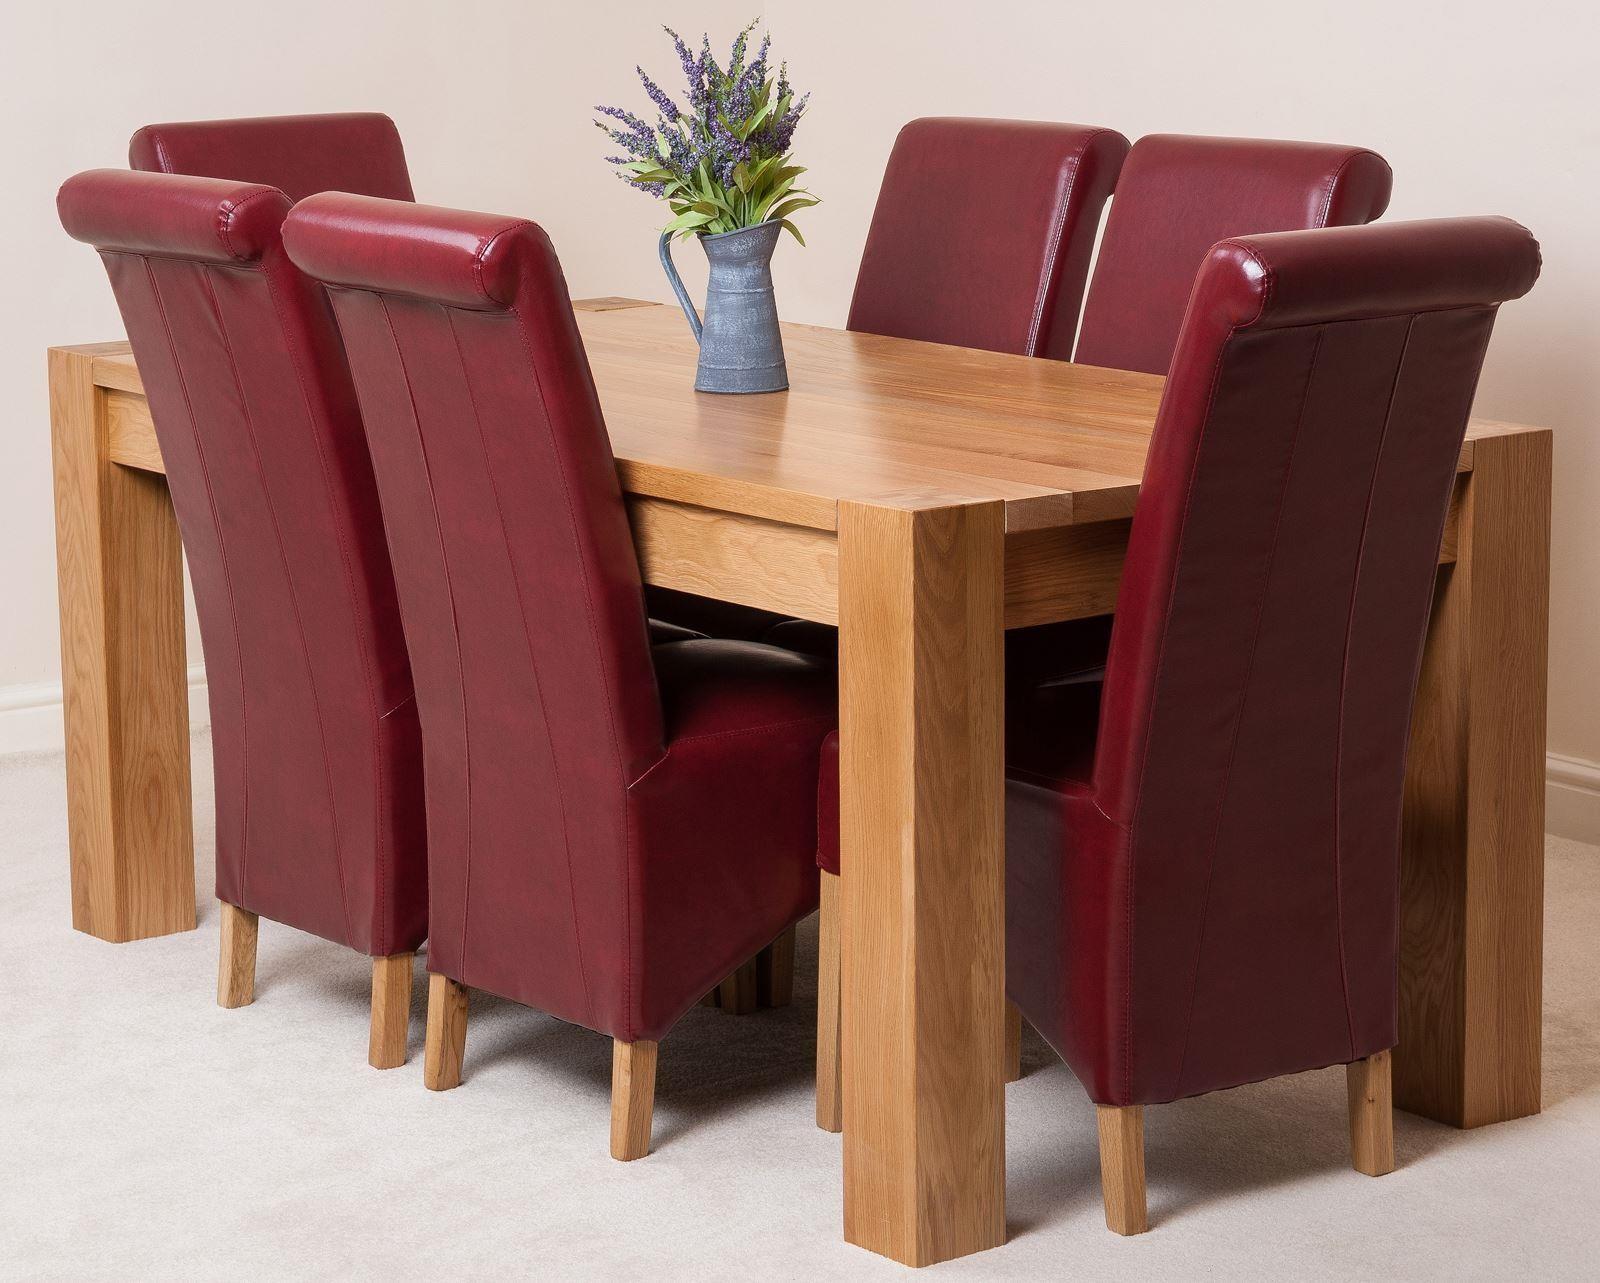 Kuba Oak Dining Table with 9 Burgundy Montana Dining Chairs